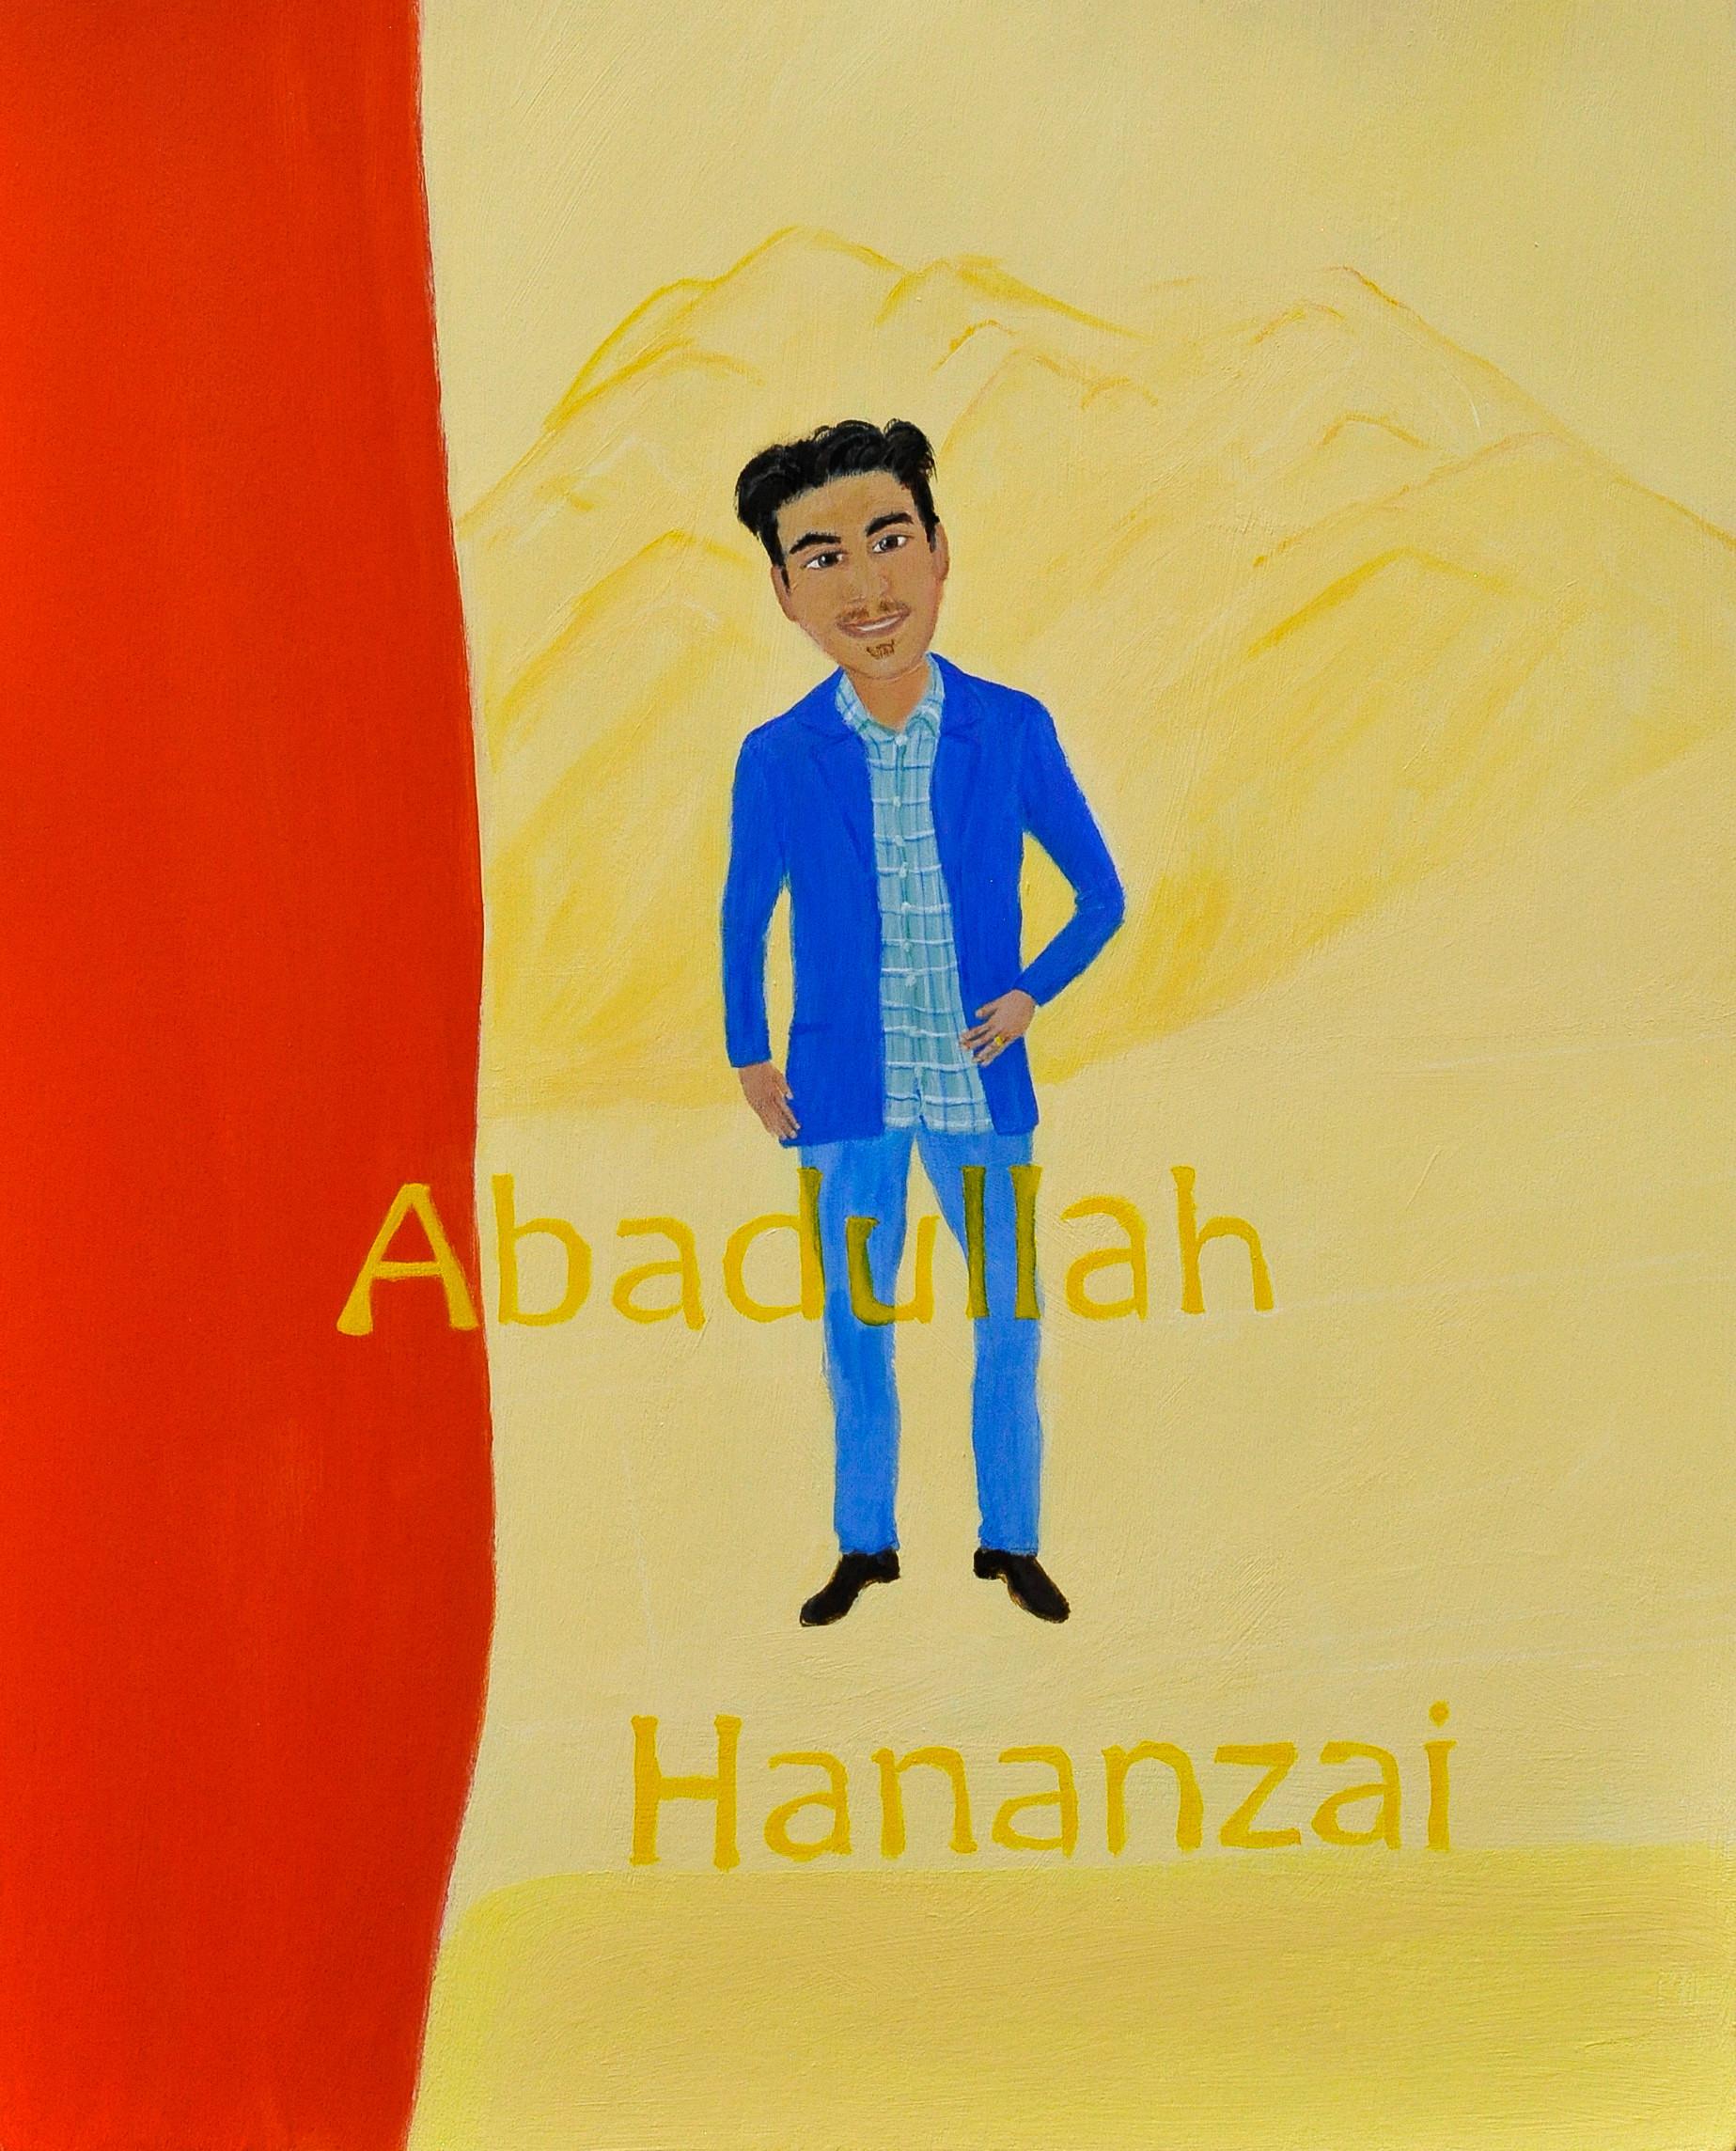 Abadullah Hananzai